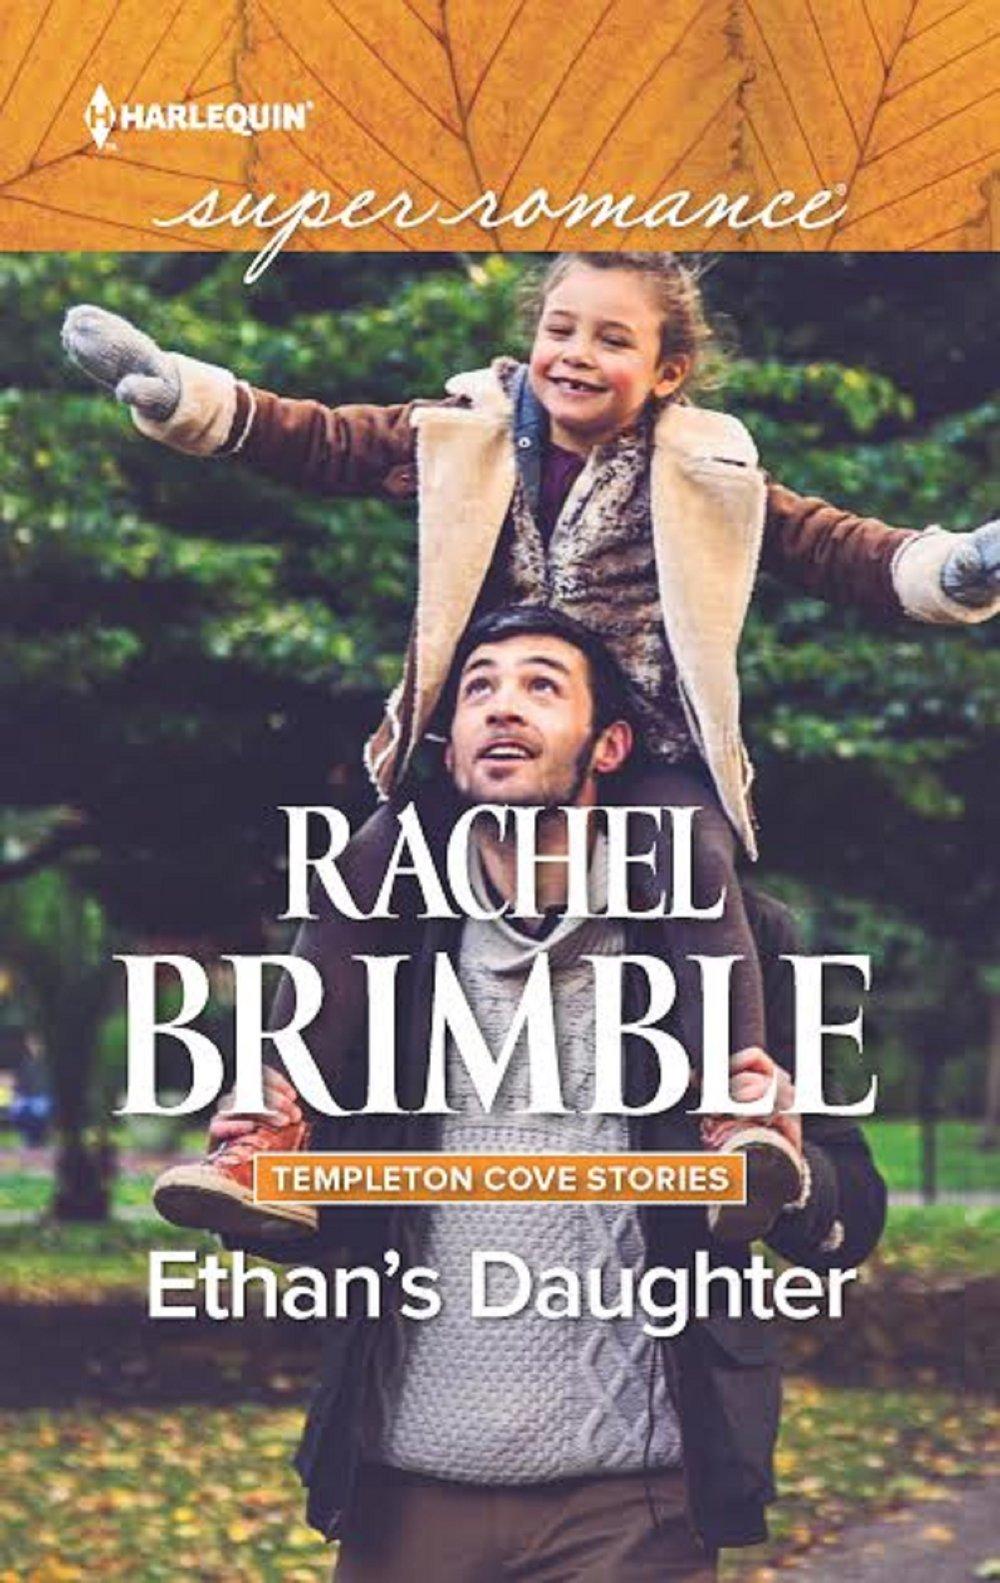 Ethans Daughter by Rachel Brimble.jpg